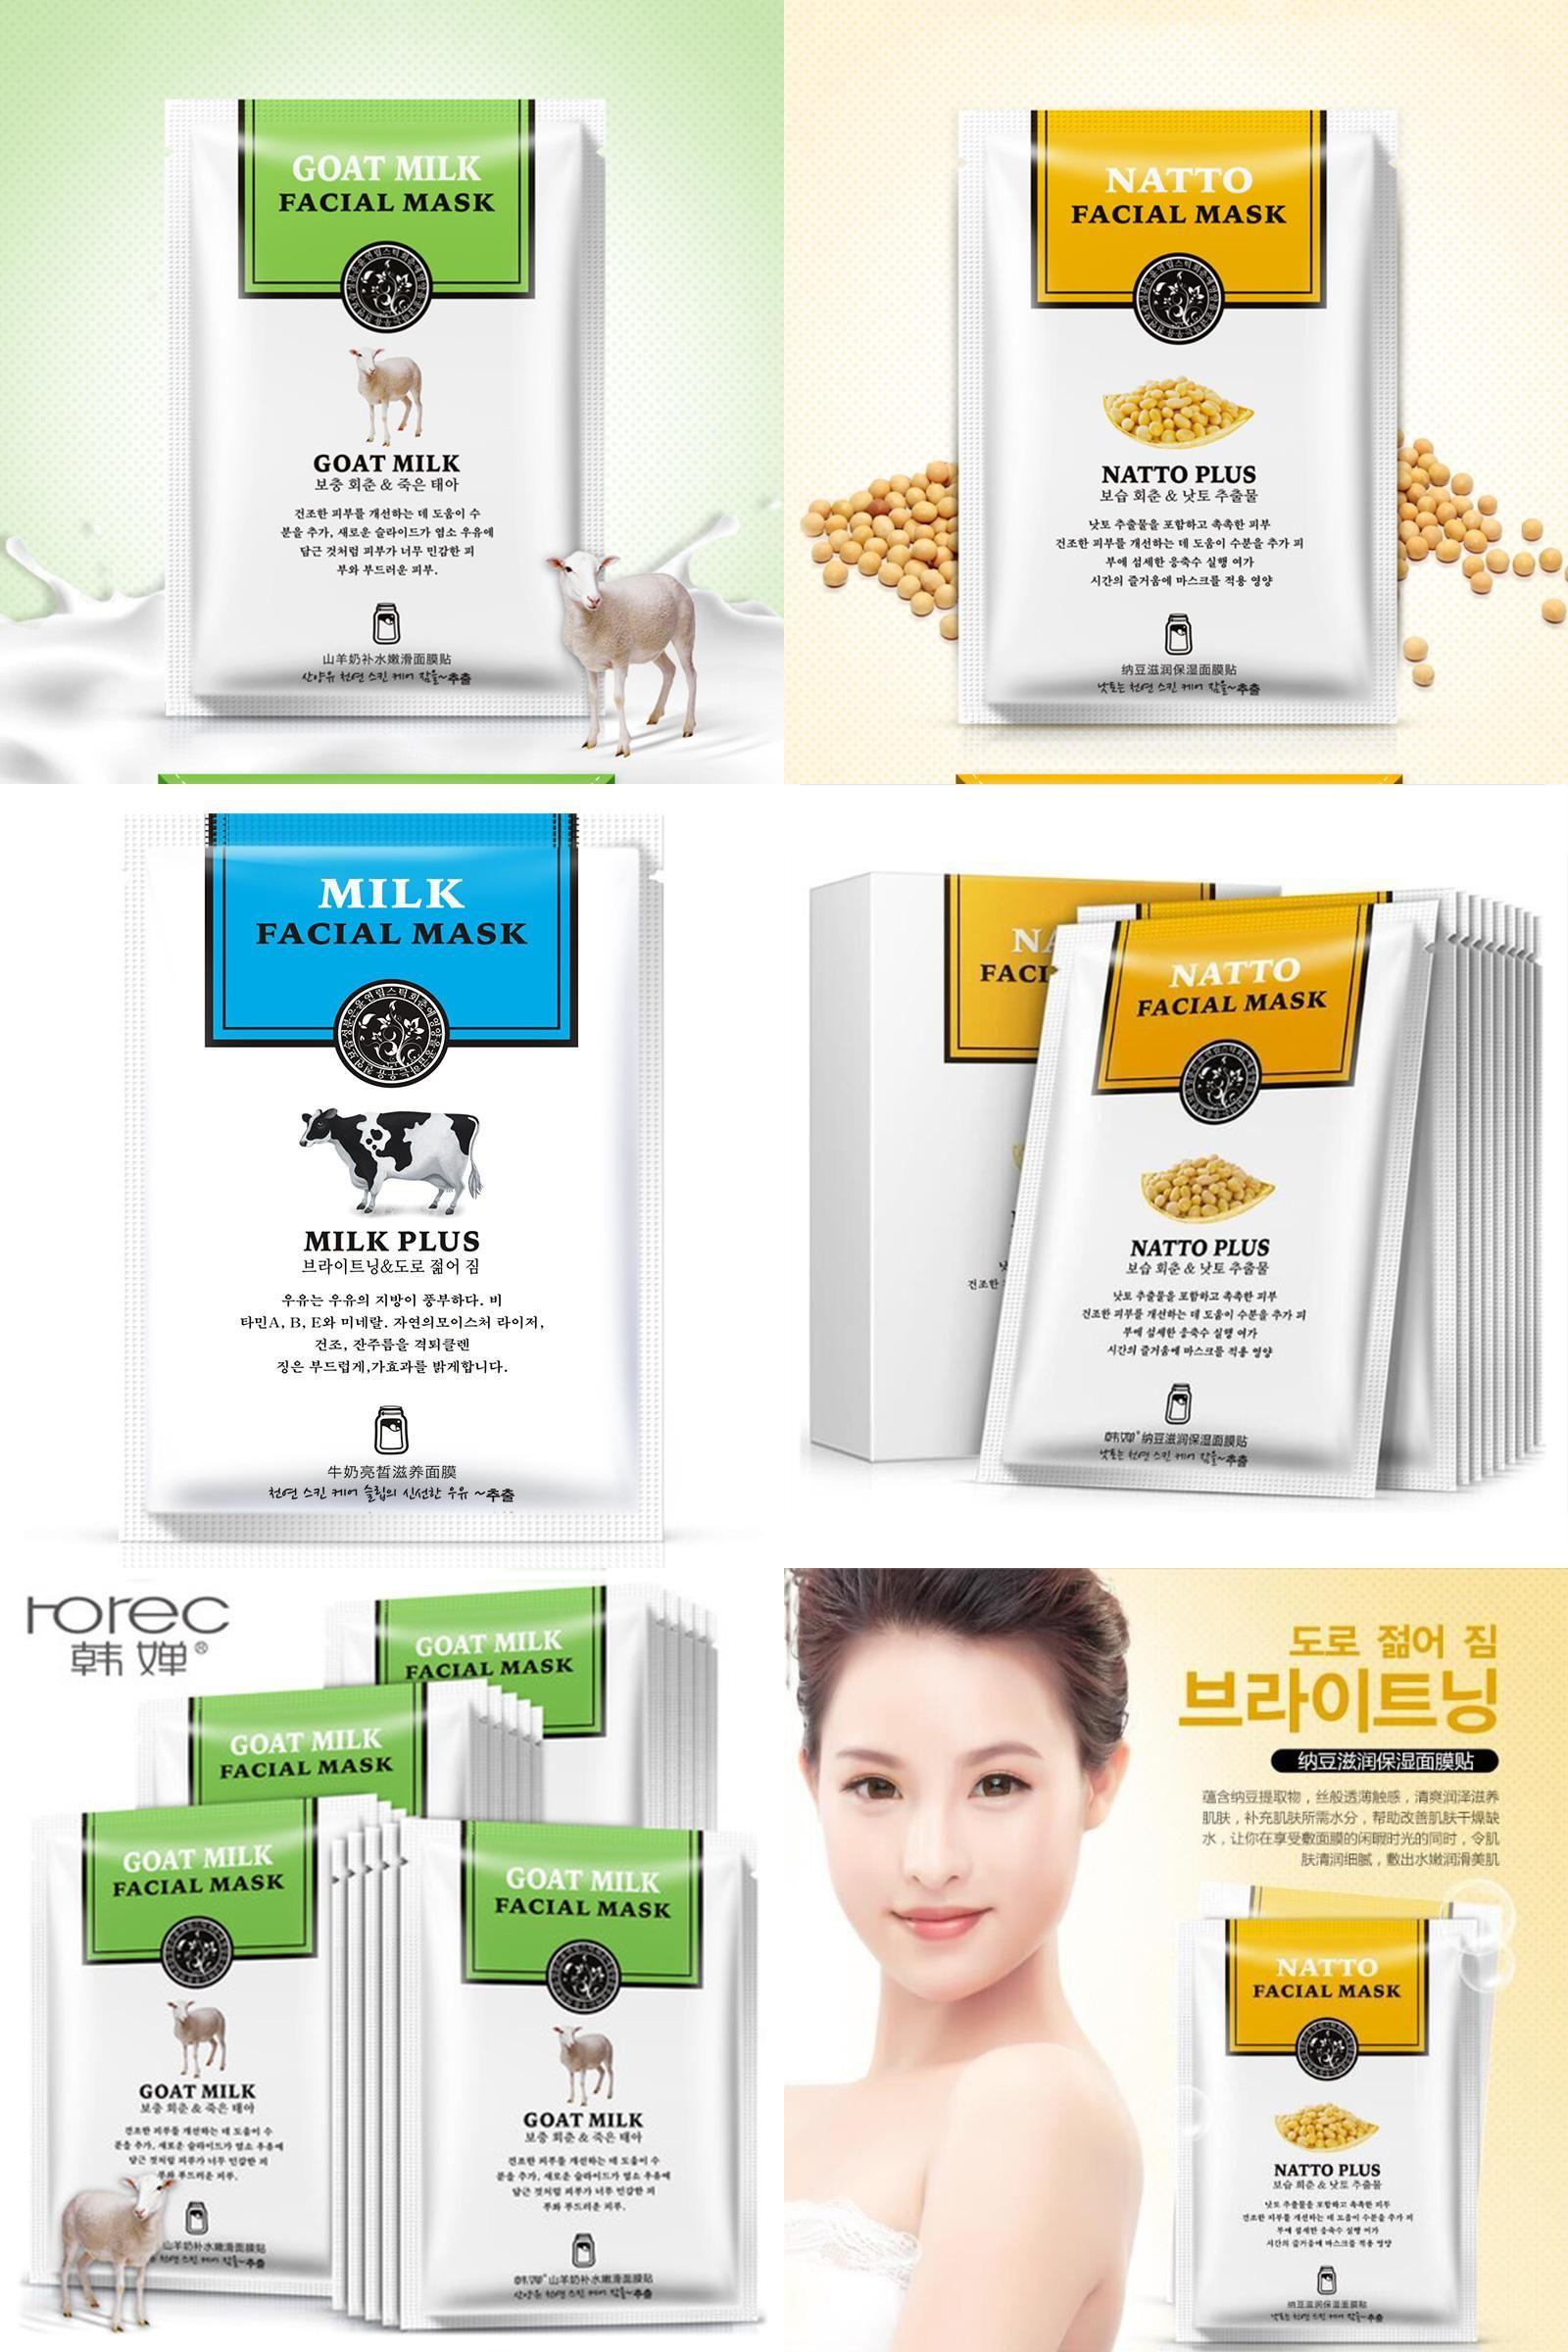 Visit To Buy Han Chan Facial Mask Skin Care Natto Goat Milk Bioaqua Masker Vitamin C Wihitening Moisturizing